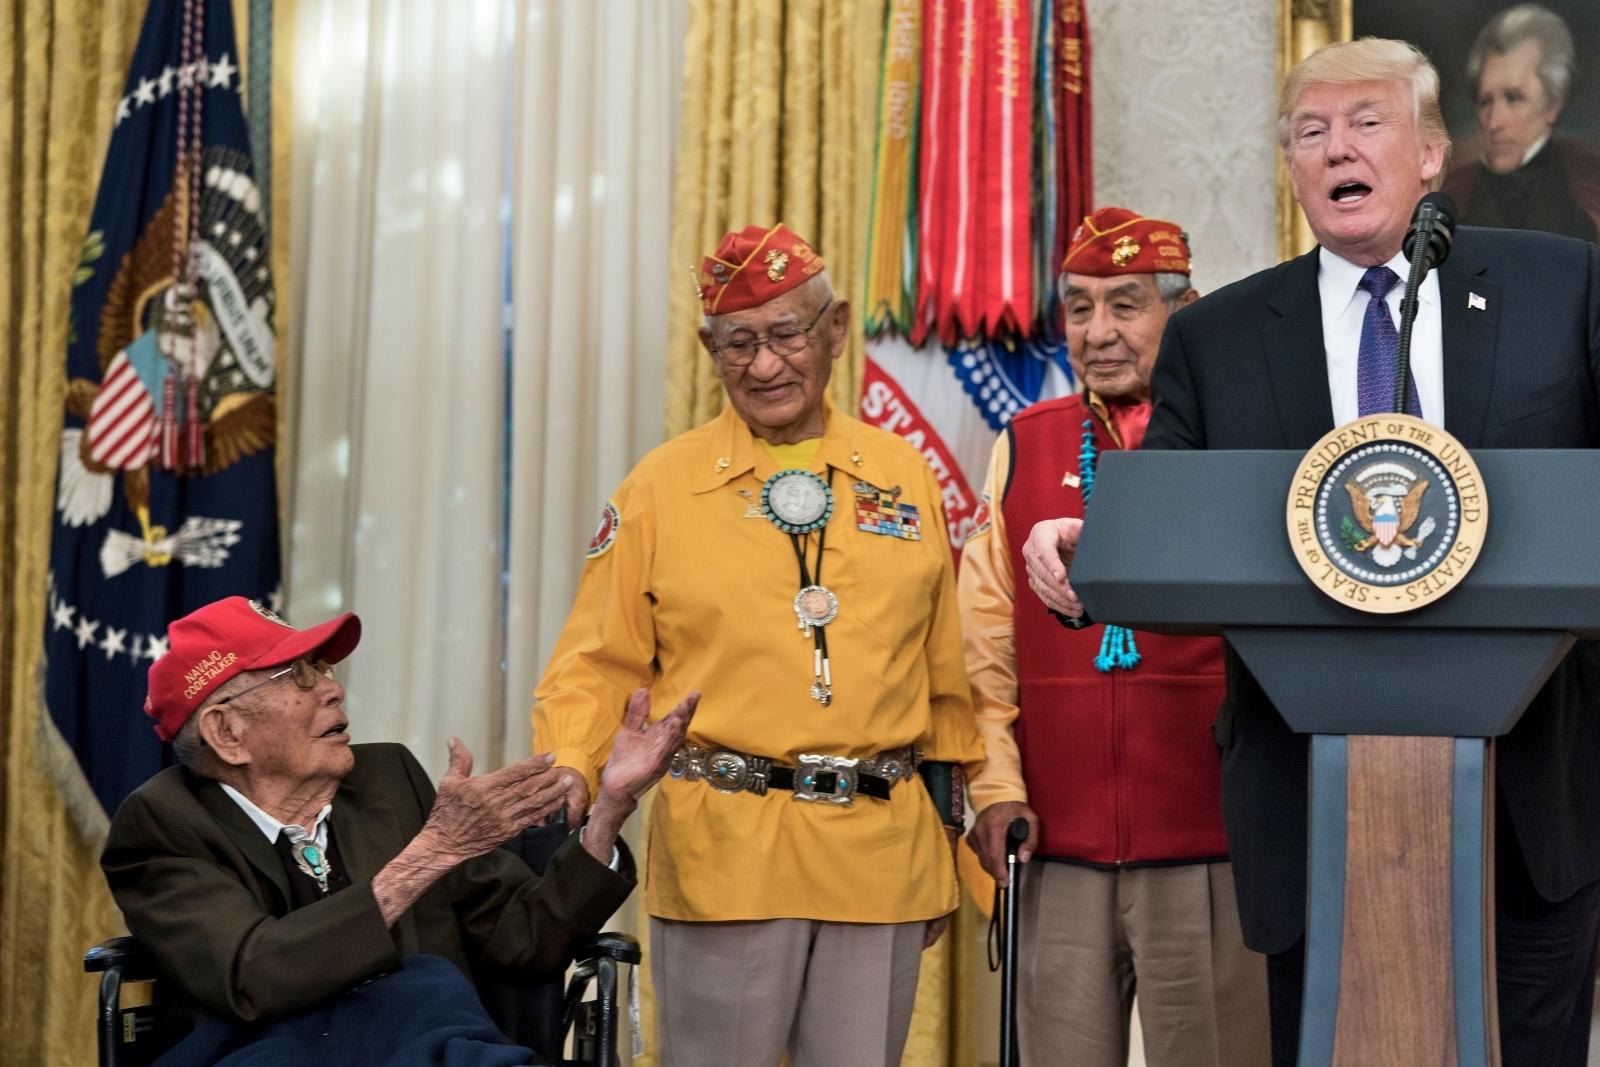 Donald Trump with Native American veterans